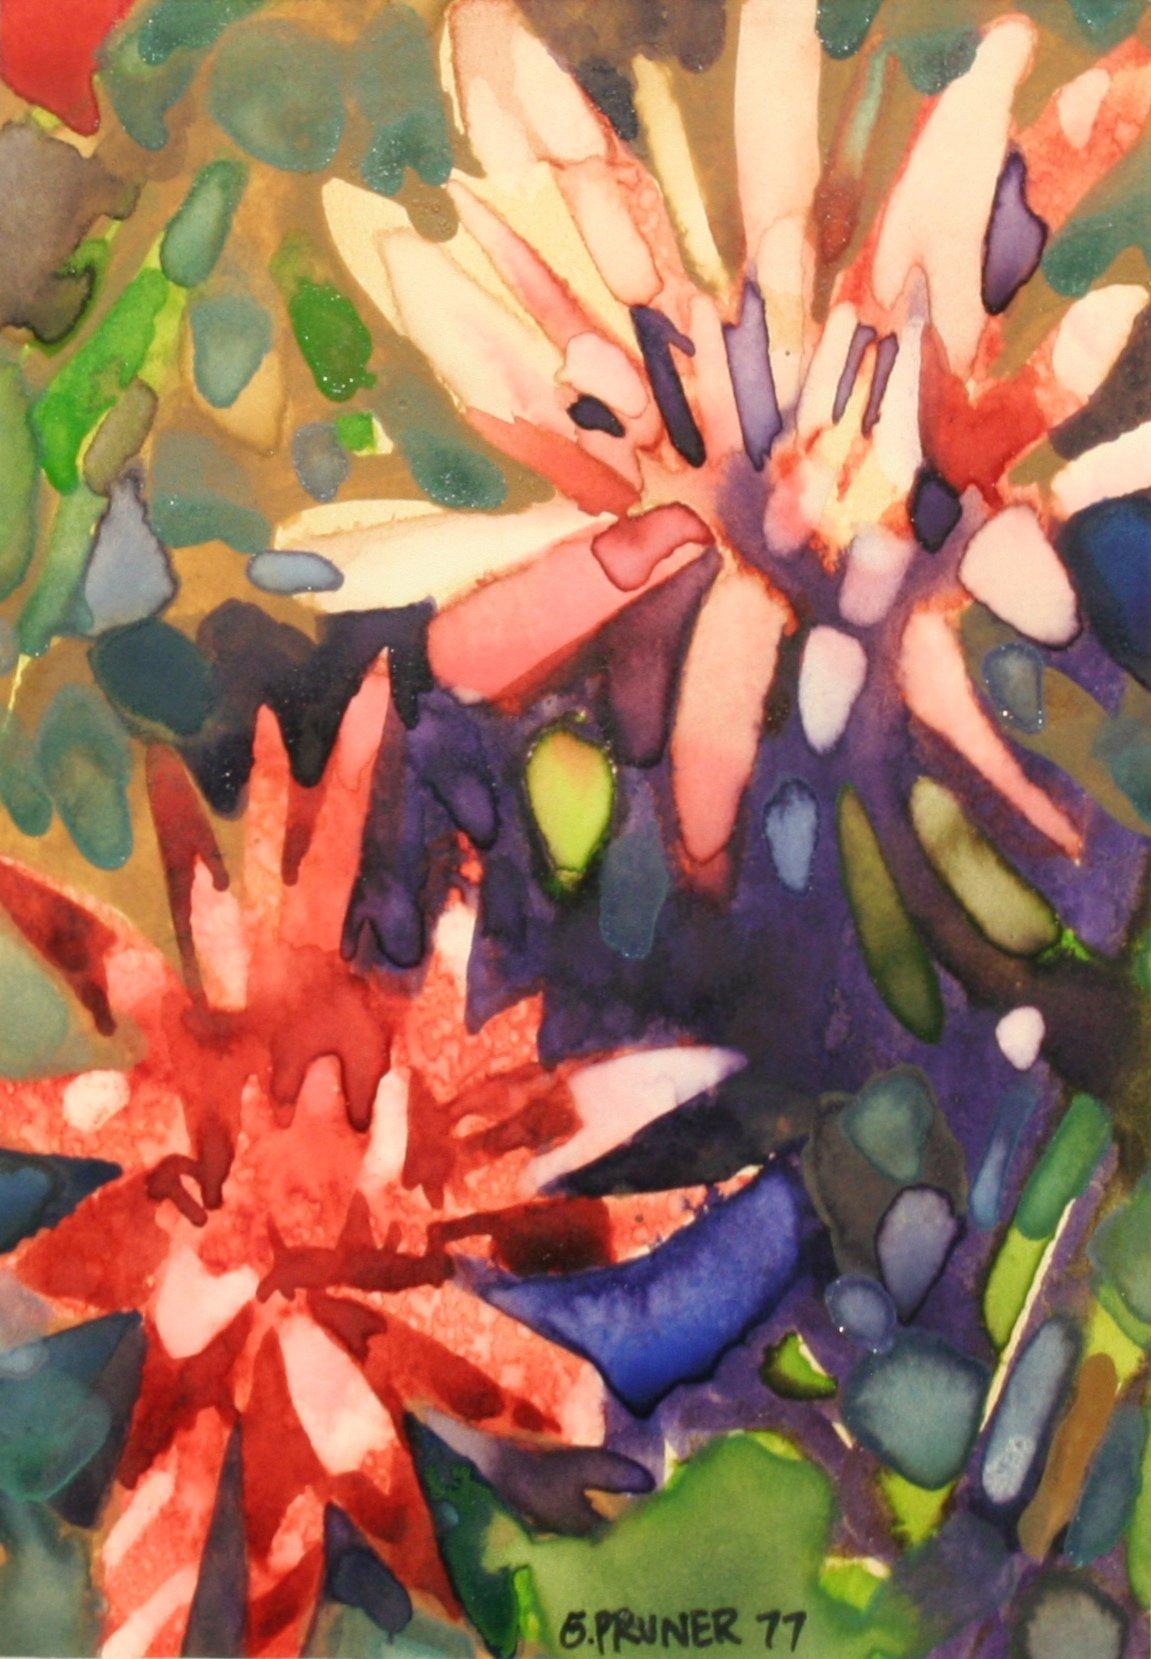 Pruner, Gary – Red Flowers